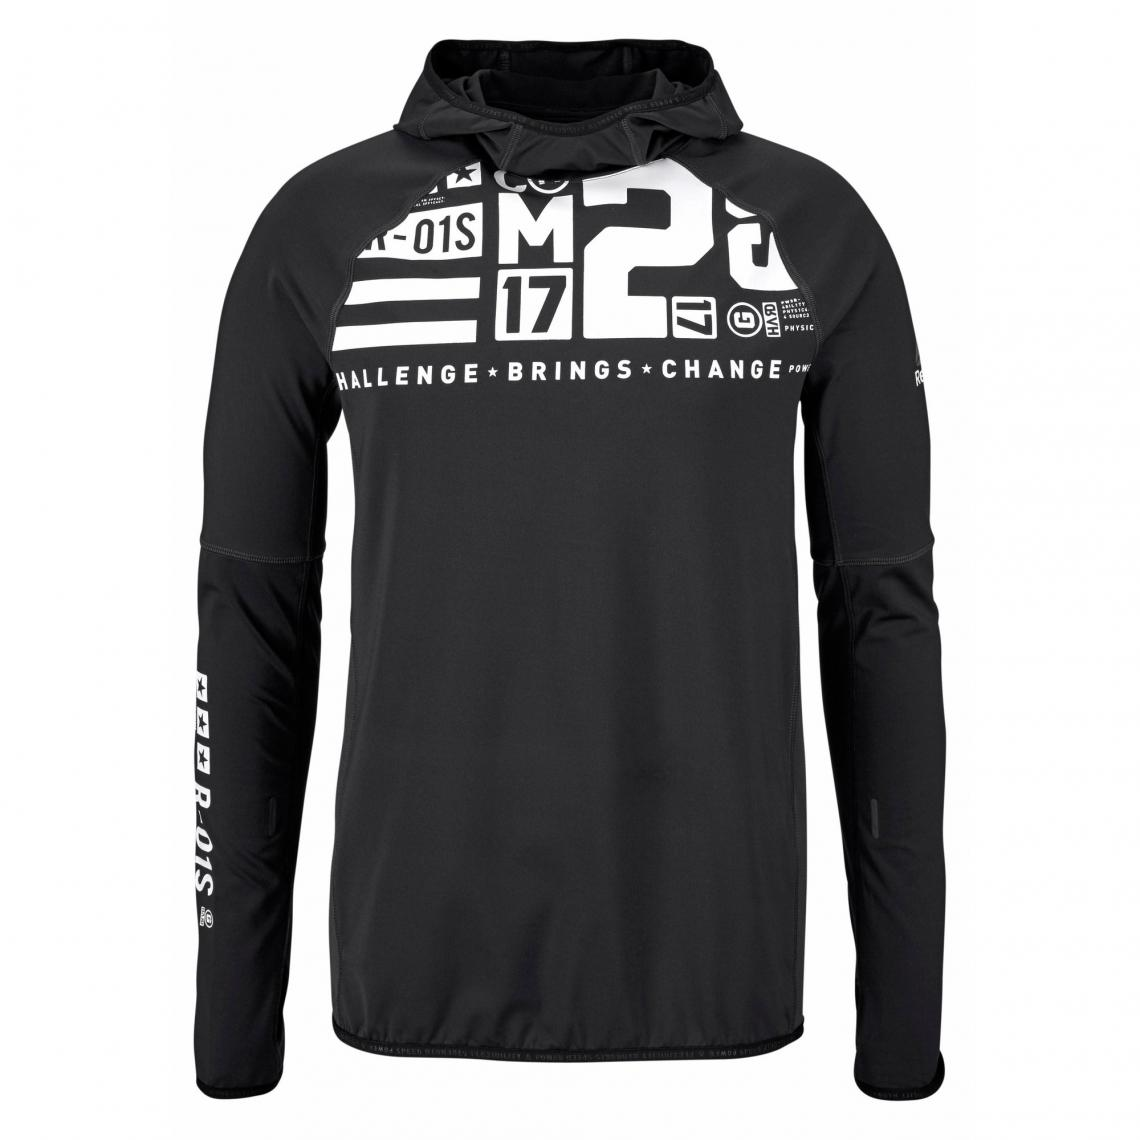 1 45 À One Homme Noir T Manches Reebok Shirt Speedwick® Series Longues Avis htdrsQC